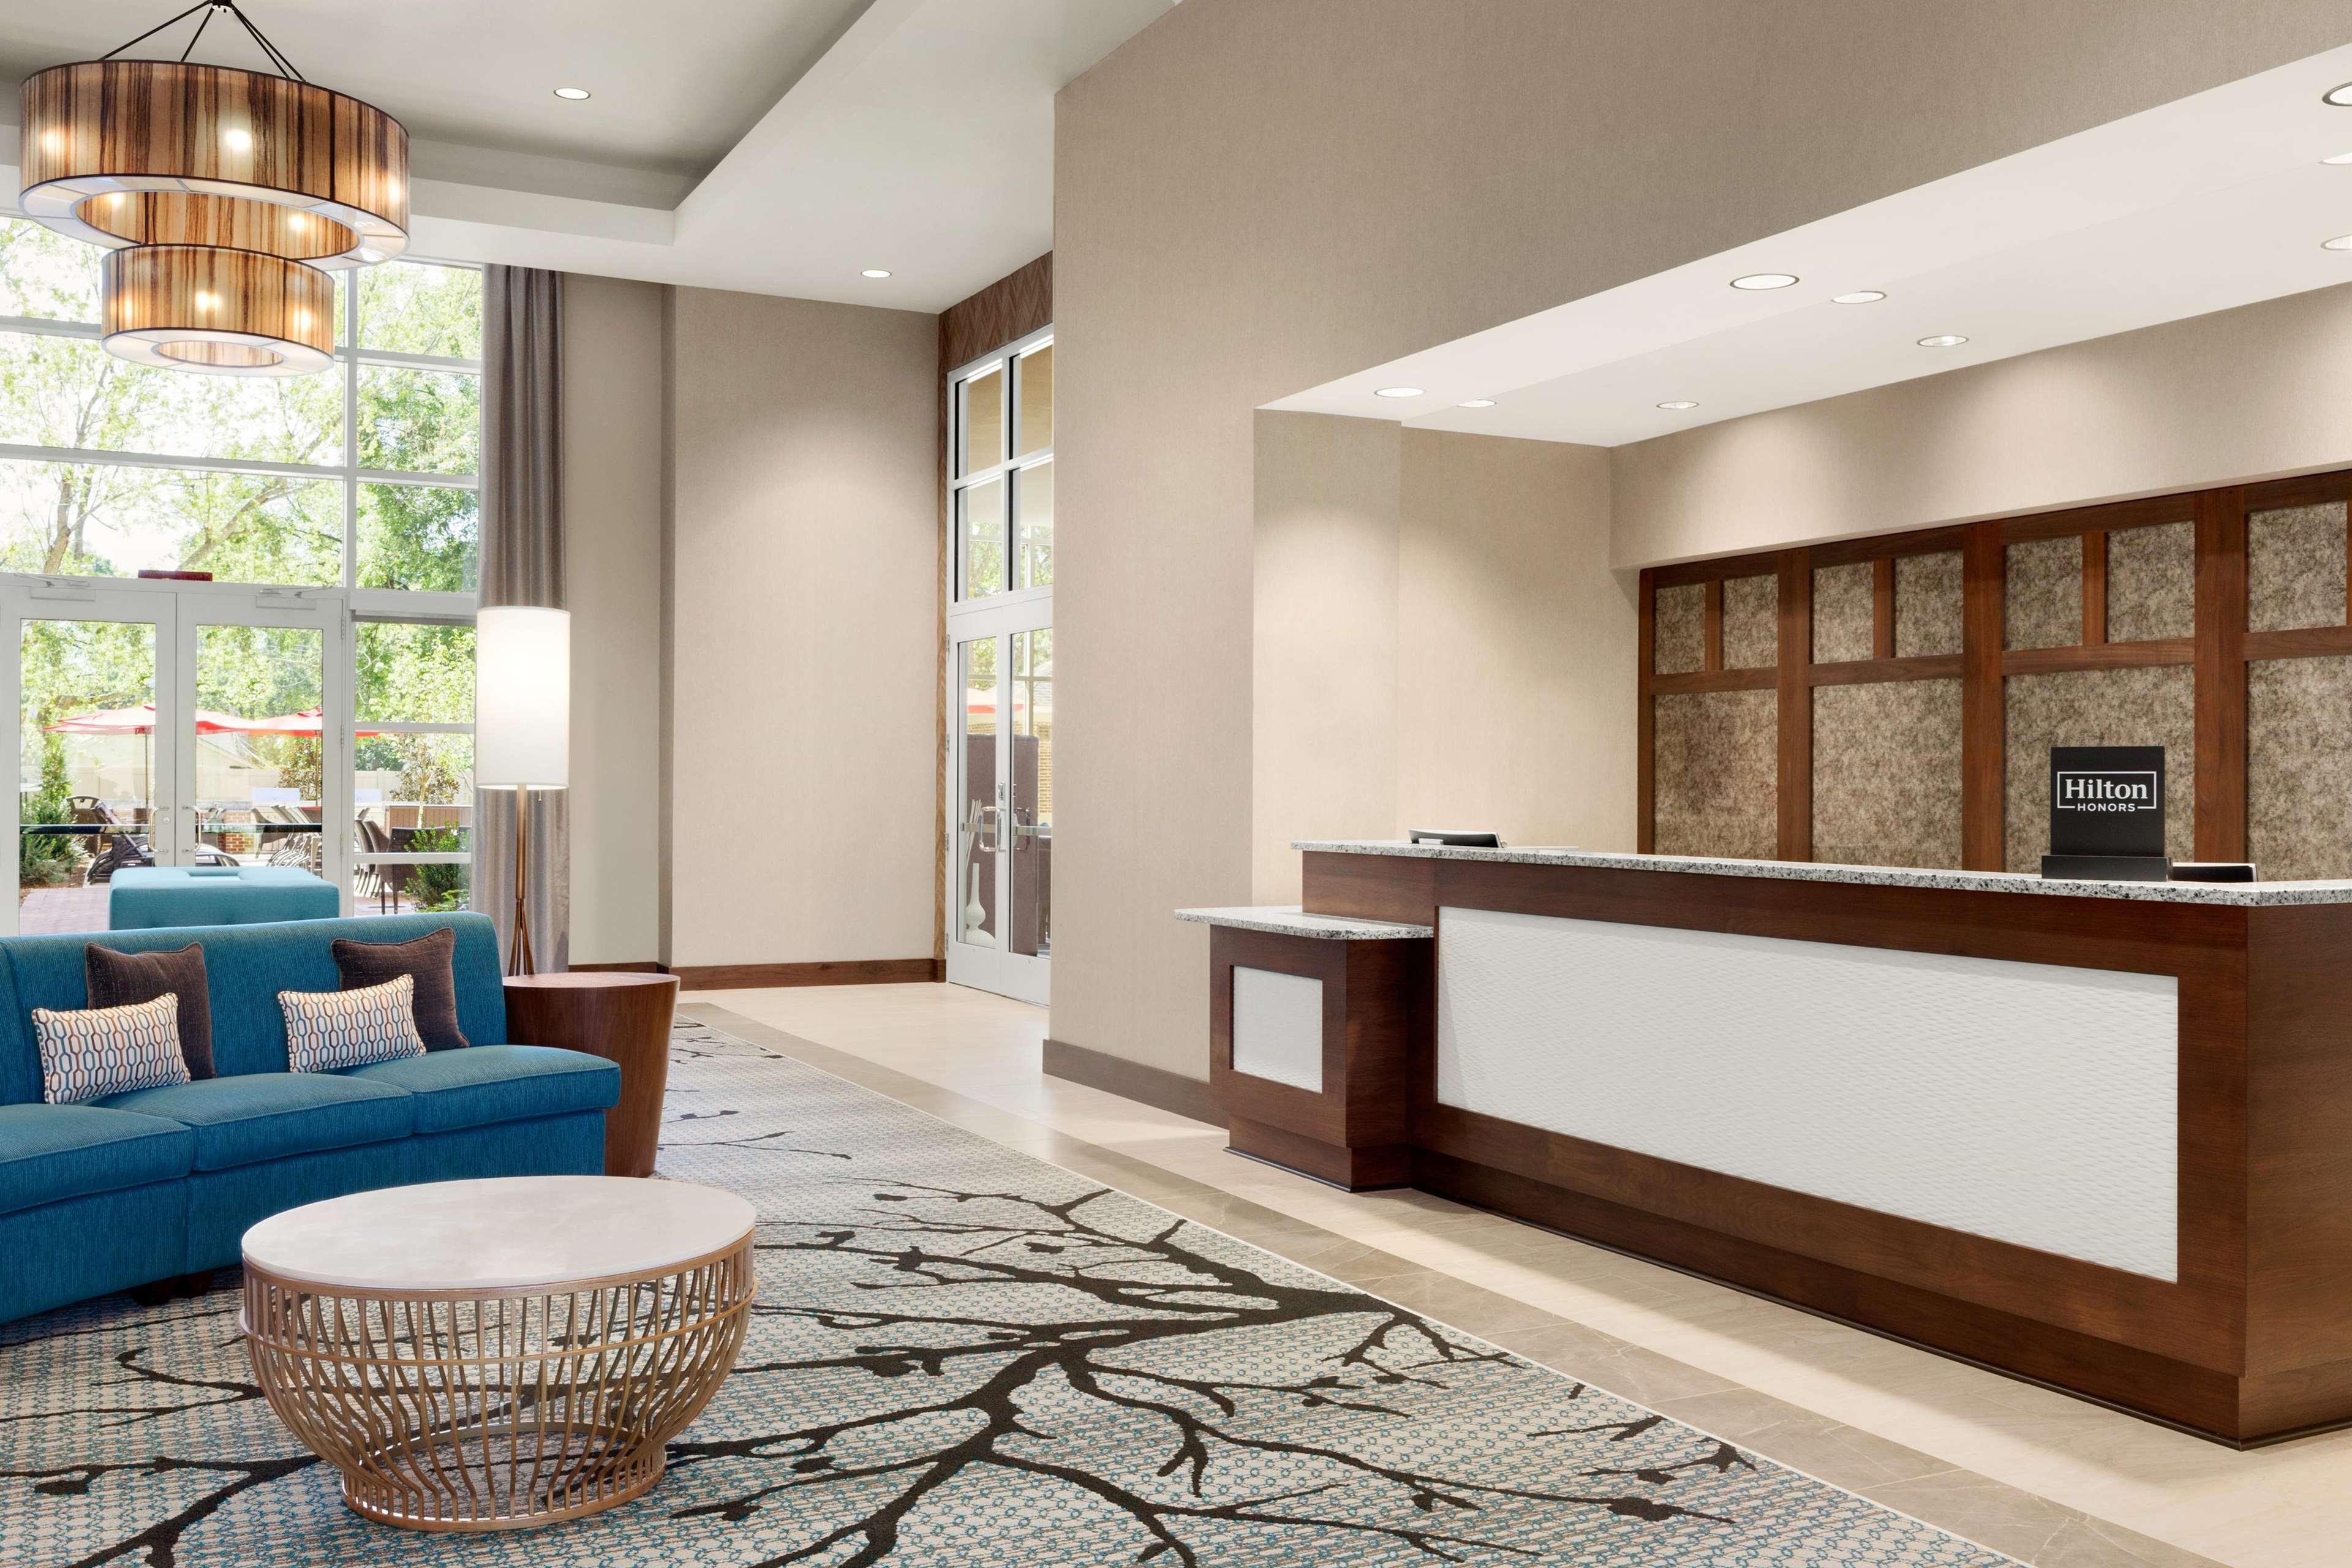 Homewood Suites by Hilton Charlotte/SouthPark image 1